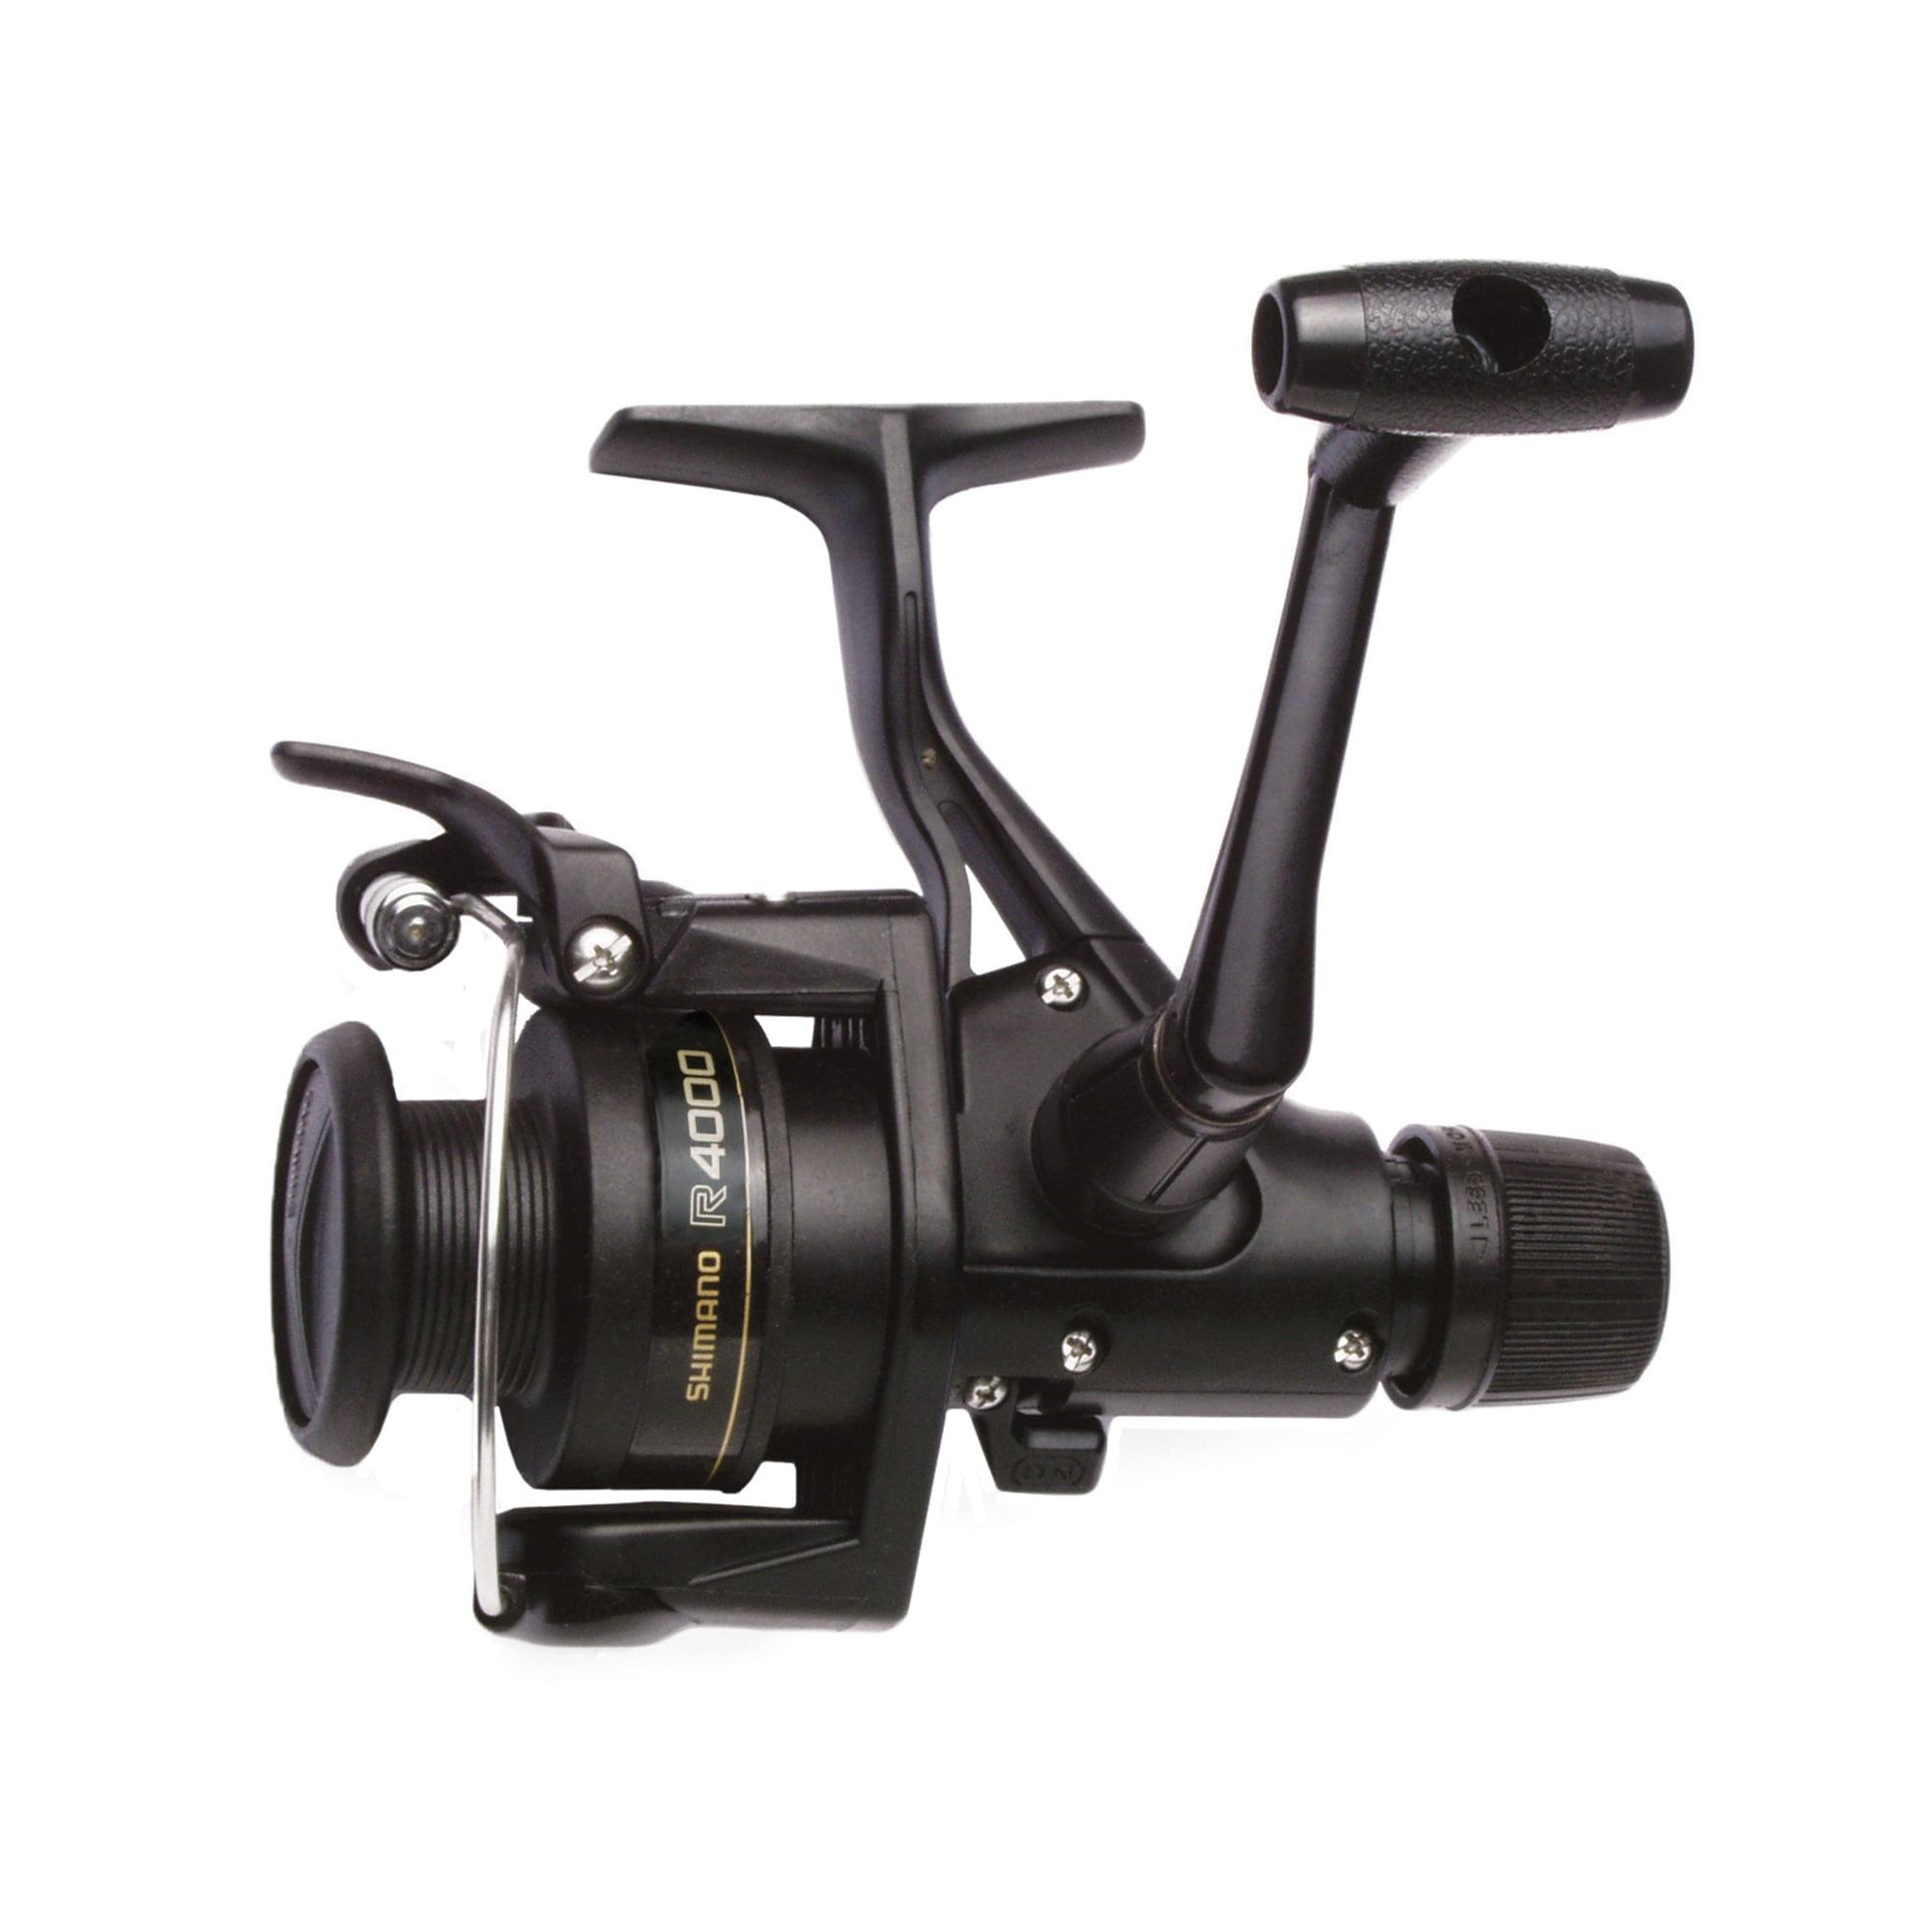 Shimano IX1000R Spinning Reel 1000 Reel Size, 4 1:1 Gear Rtio, 19